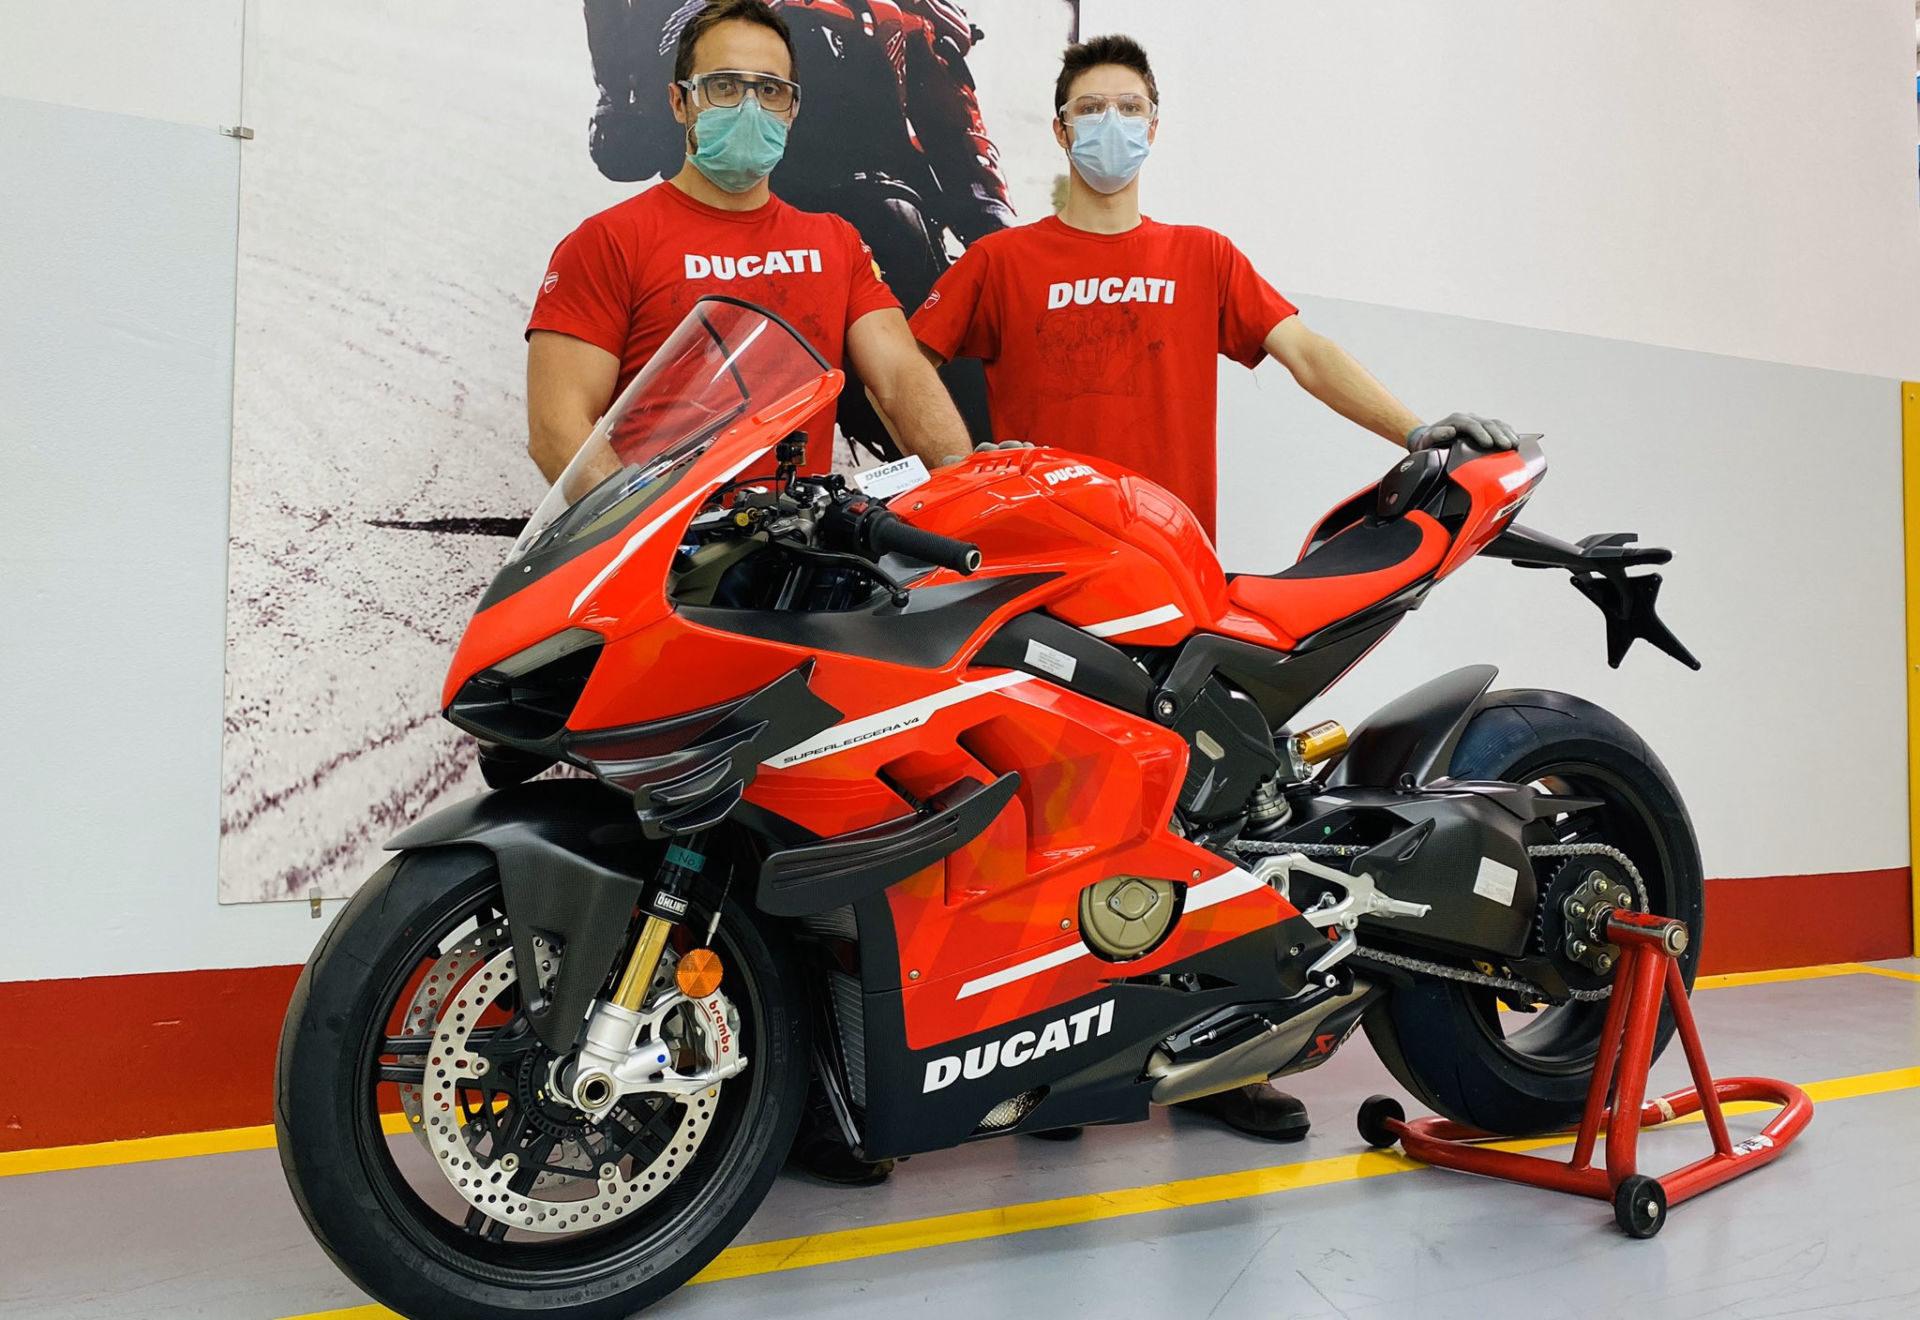 Ducati Superleggera V4 Nearing Production Roadracing World Magazine Motorcycle Riding Racing Tech News